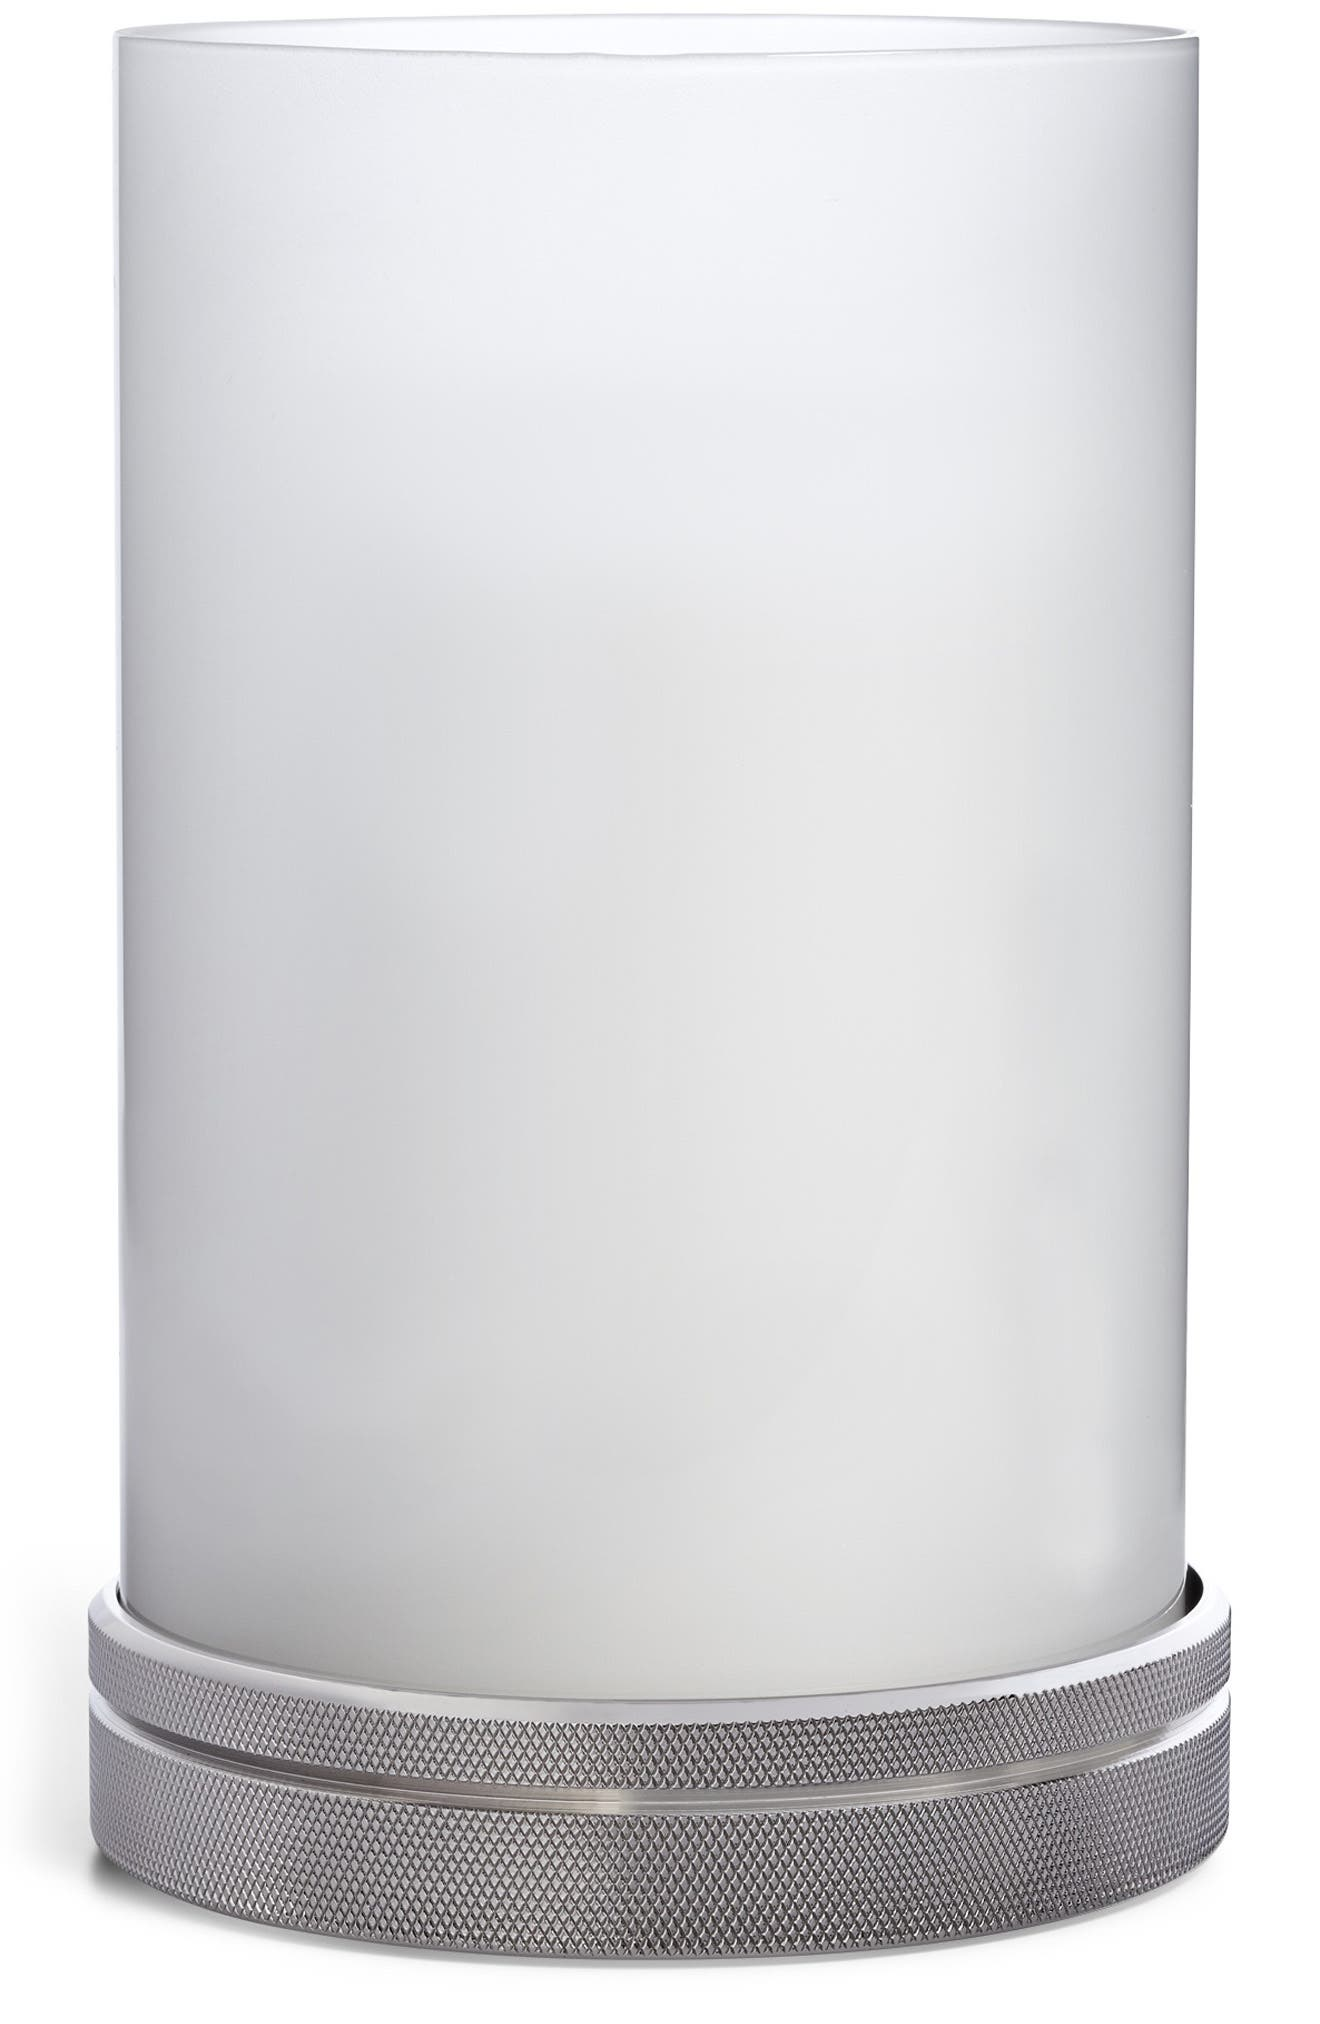 RALPH LAUREN, Paxton Hurricane Candleholder, Main thumbnail 1, color, SILVER